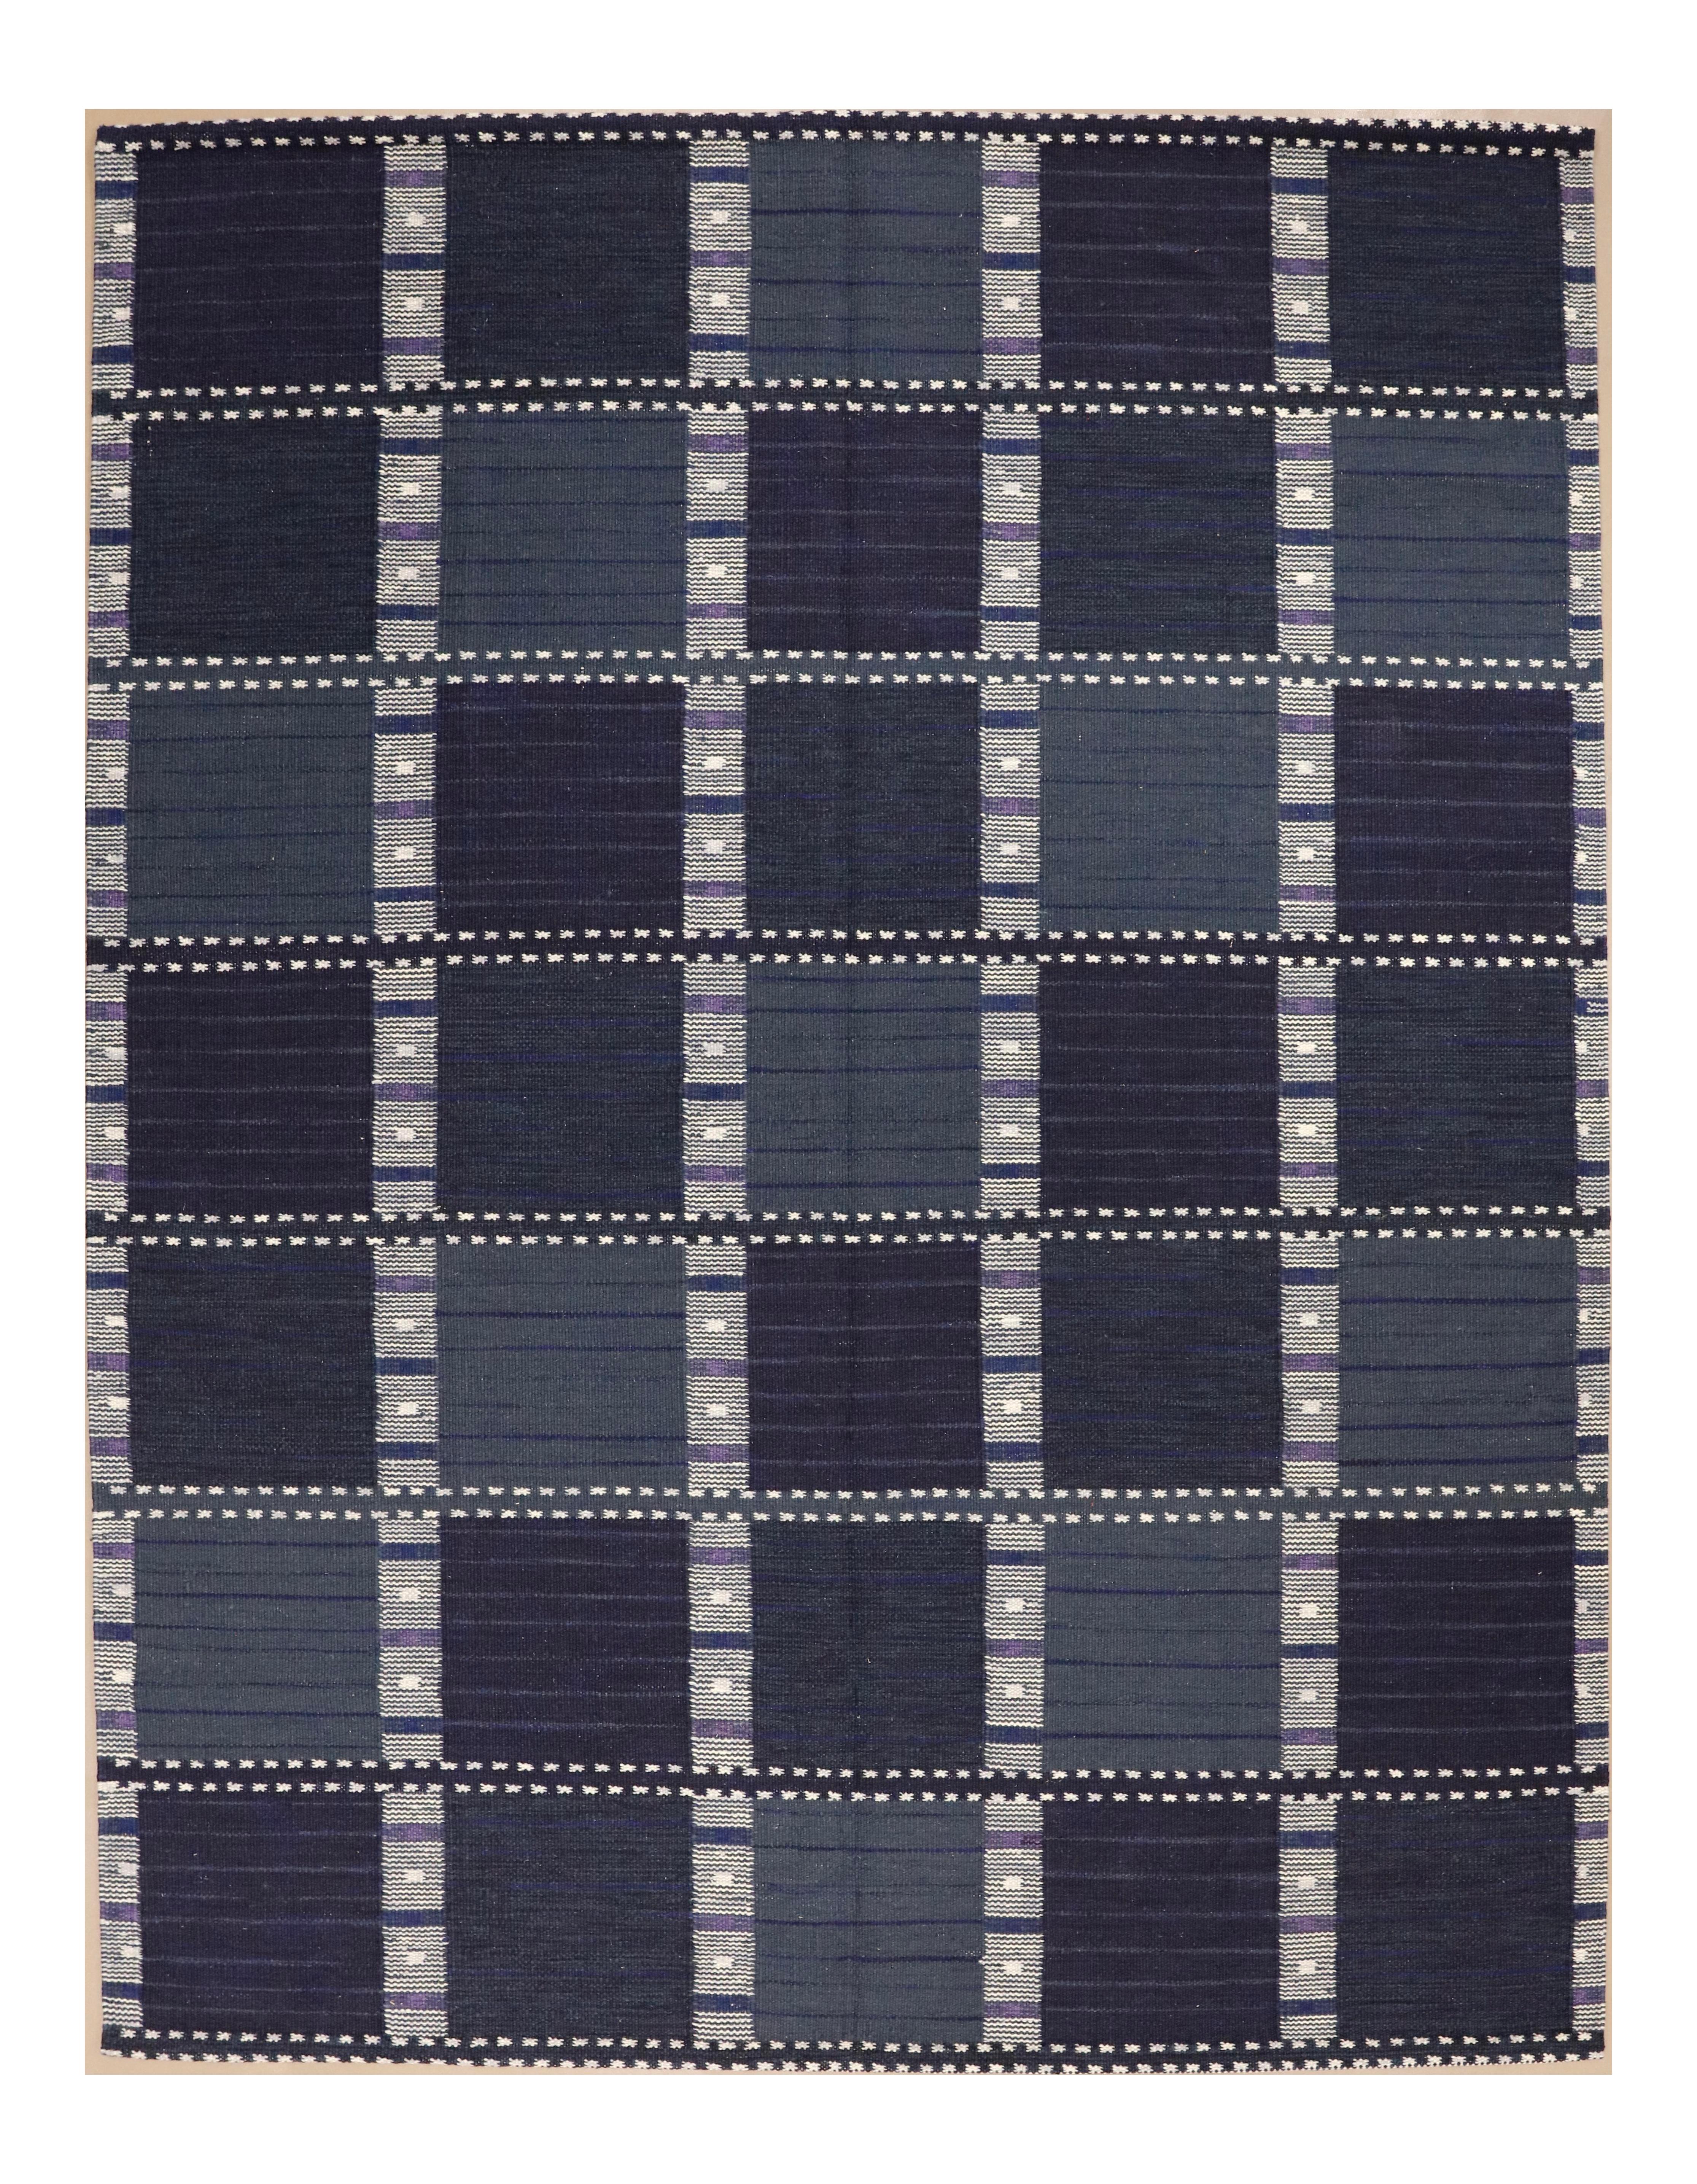 contemporary swedish marta design rug 93 12 0155